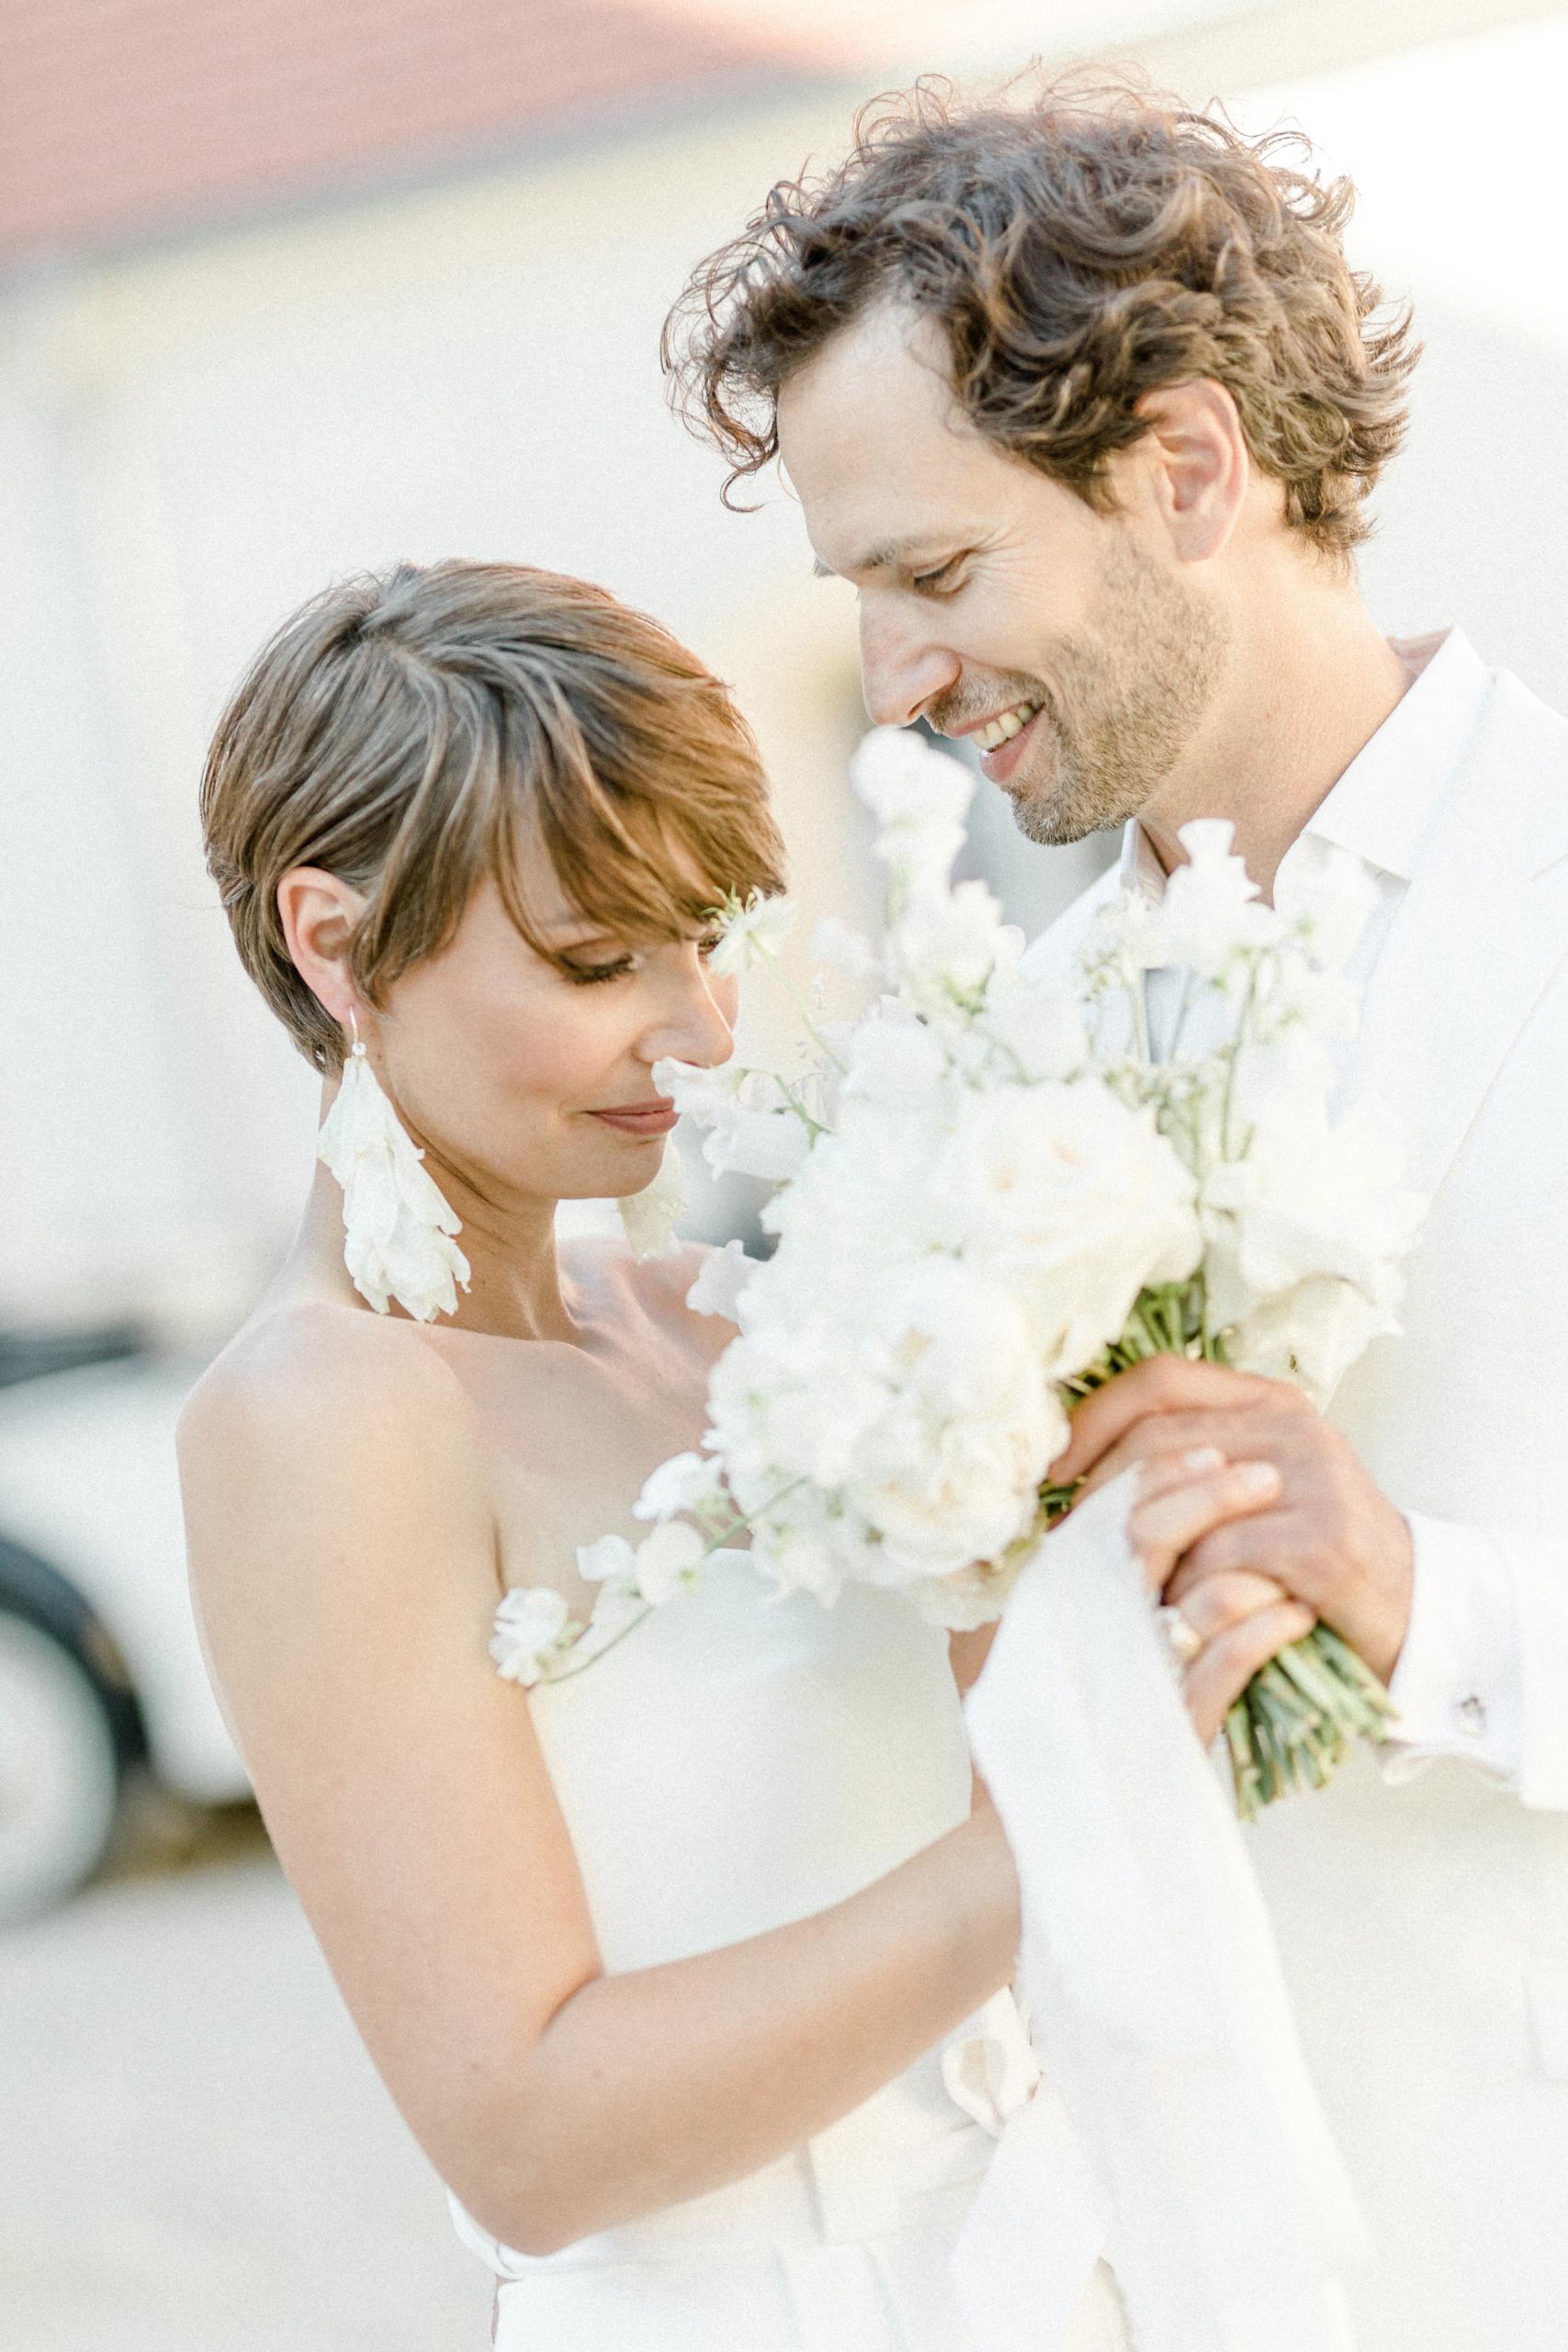 White Wedding Pour l'amour Fine Art Brautstrauß